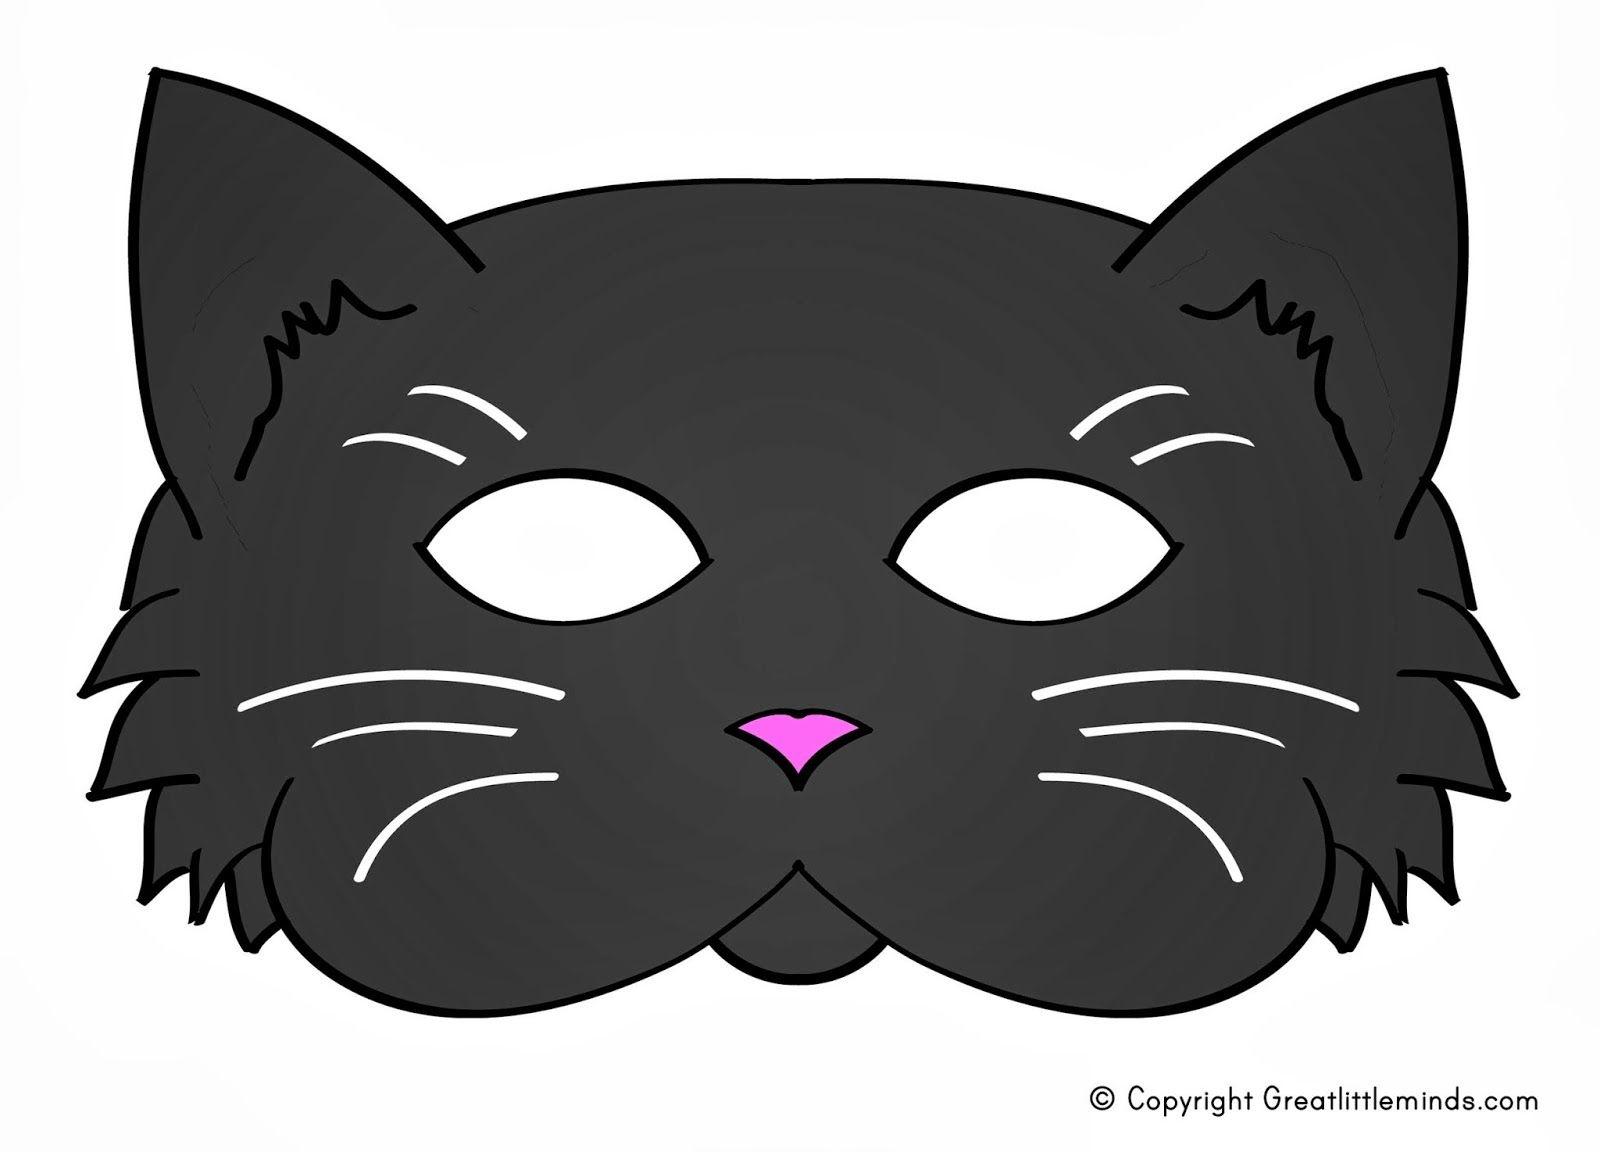 Early Play Templates: 5 Printable Halloween Cat Masks To Make | Nine - Free Printable Halloween Face Masks